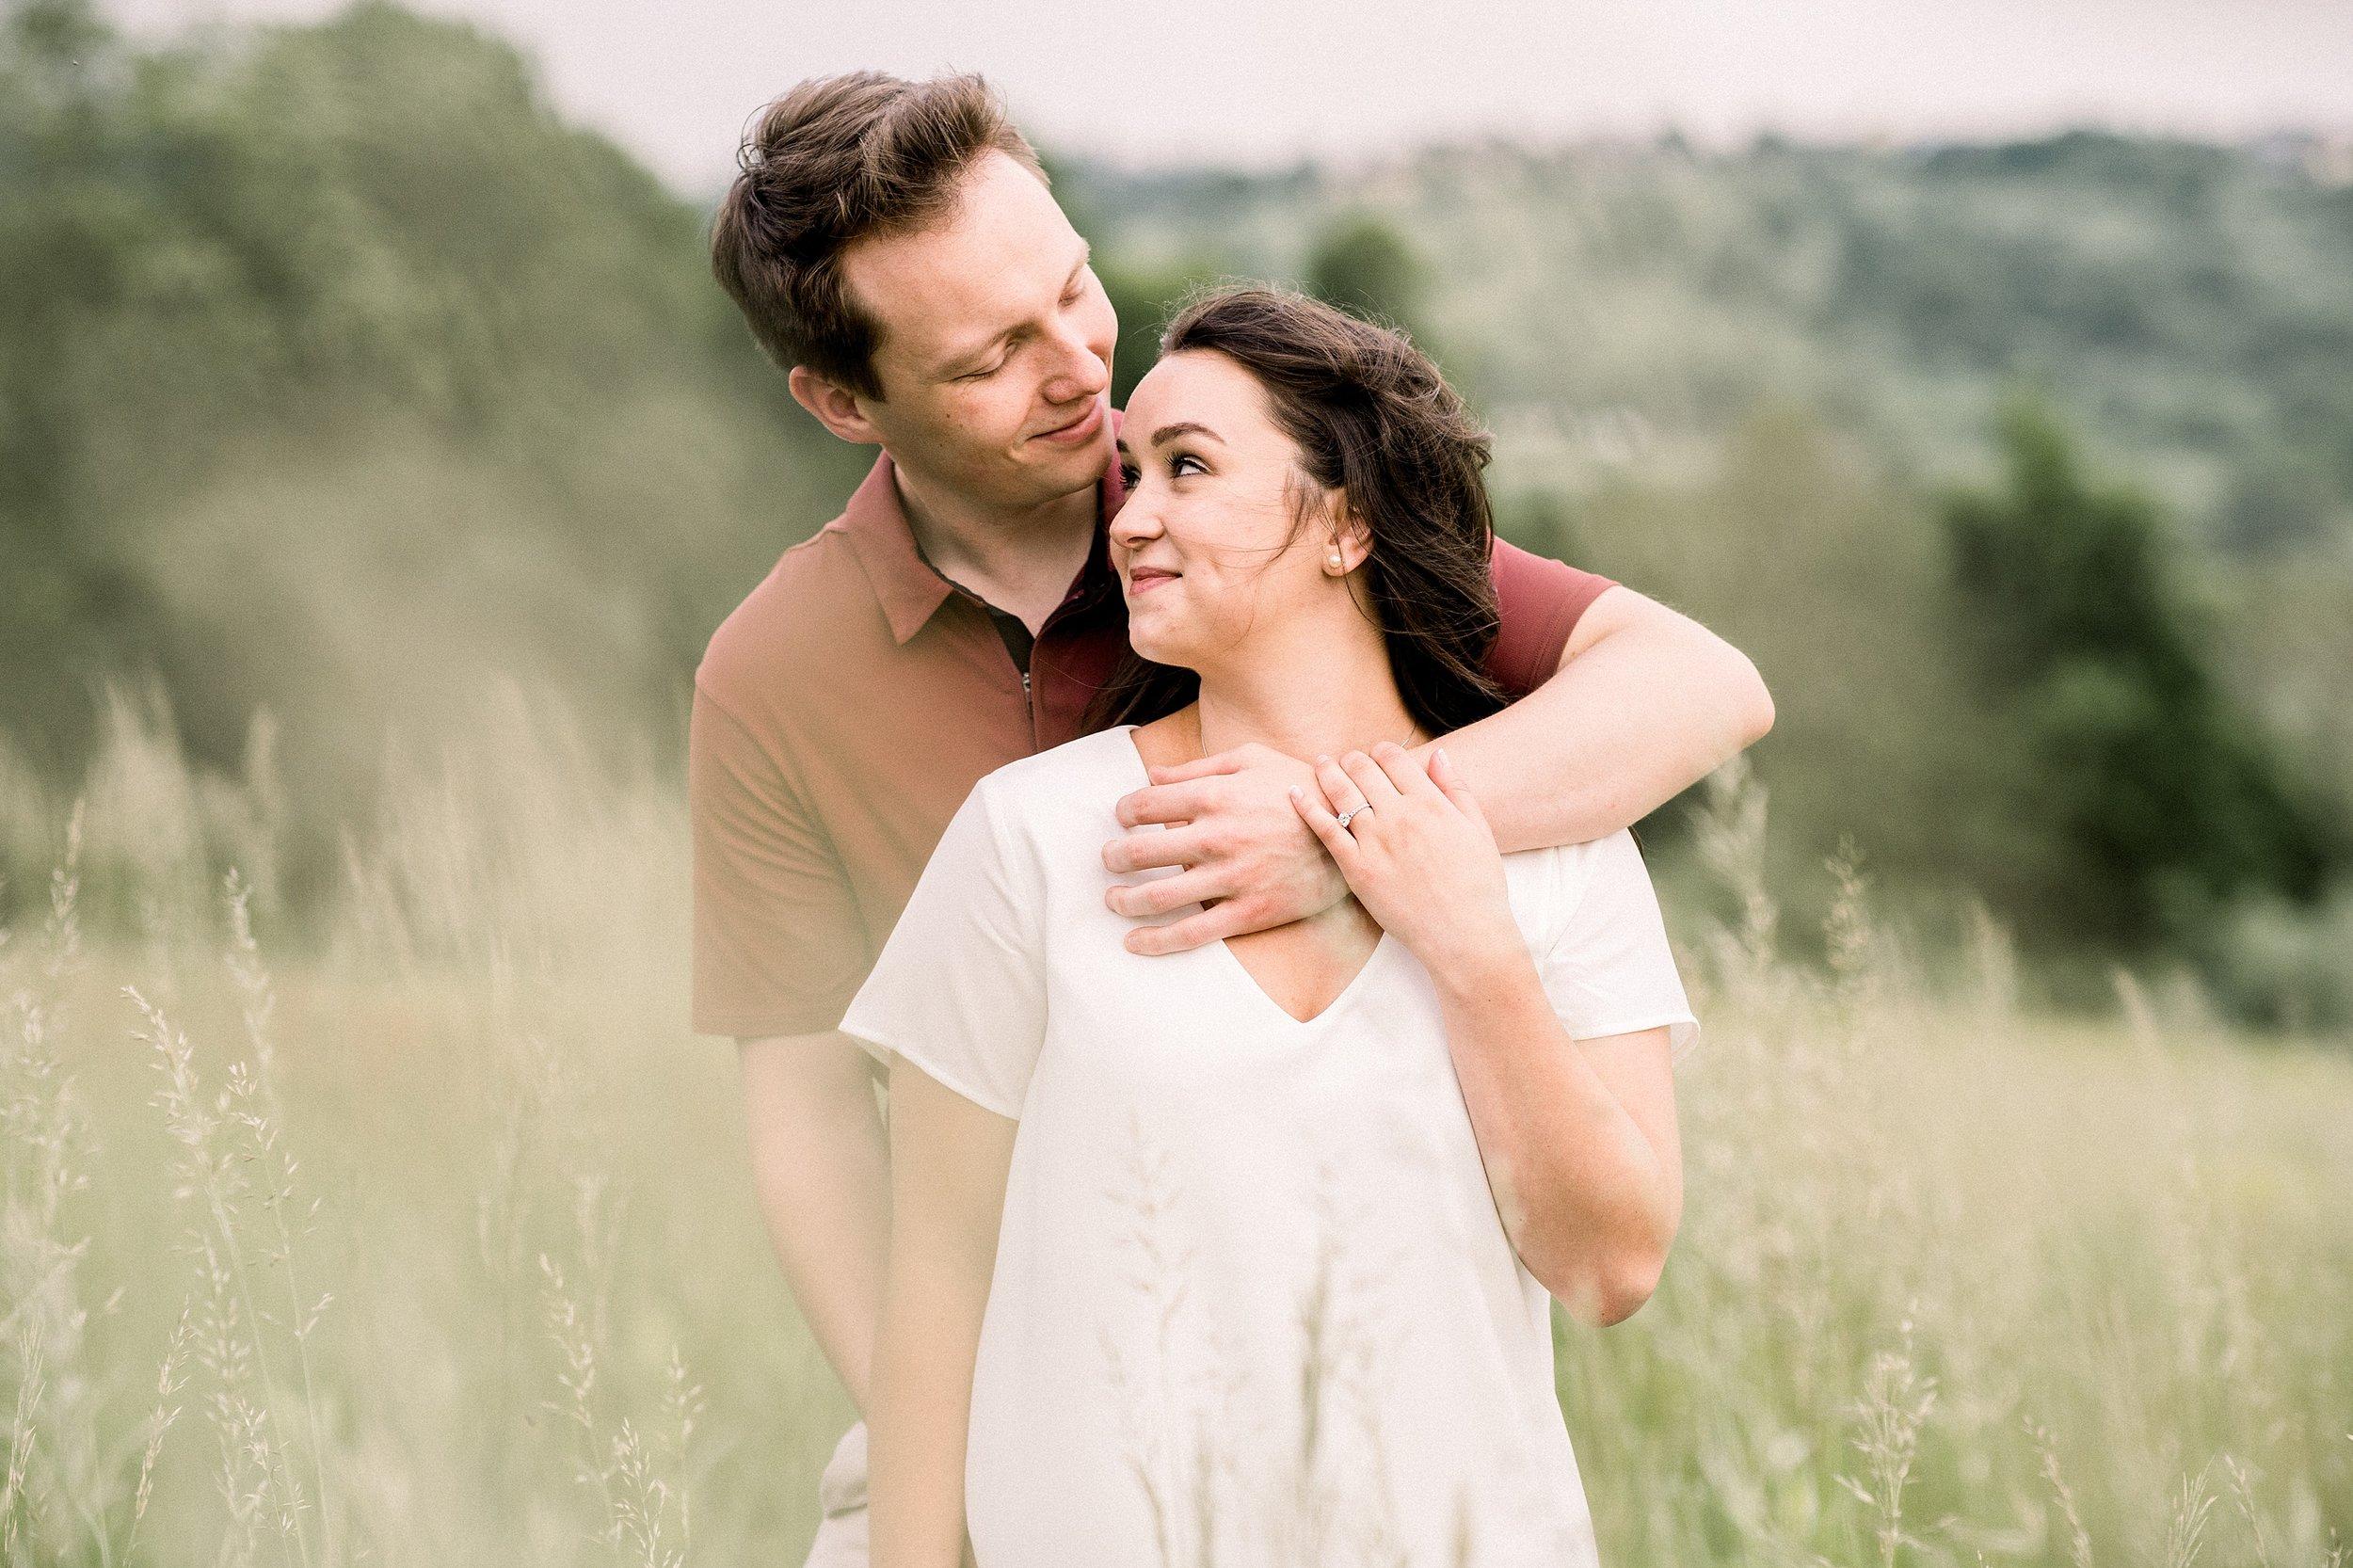 Lehigh-Valley-Wedding-Photographer_0007.jpg